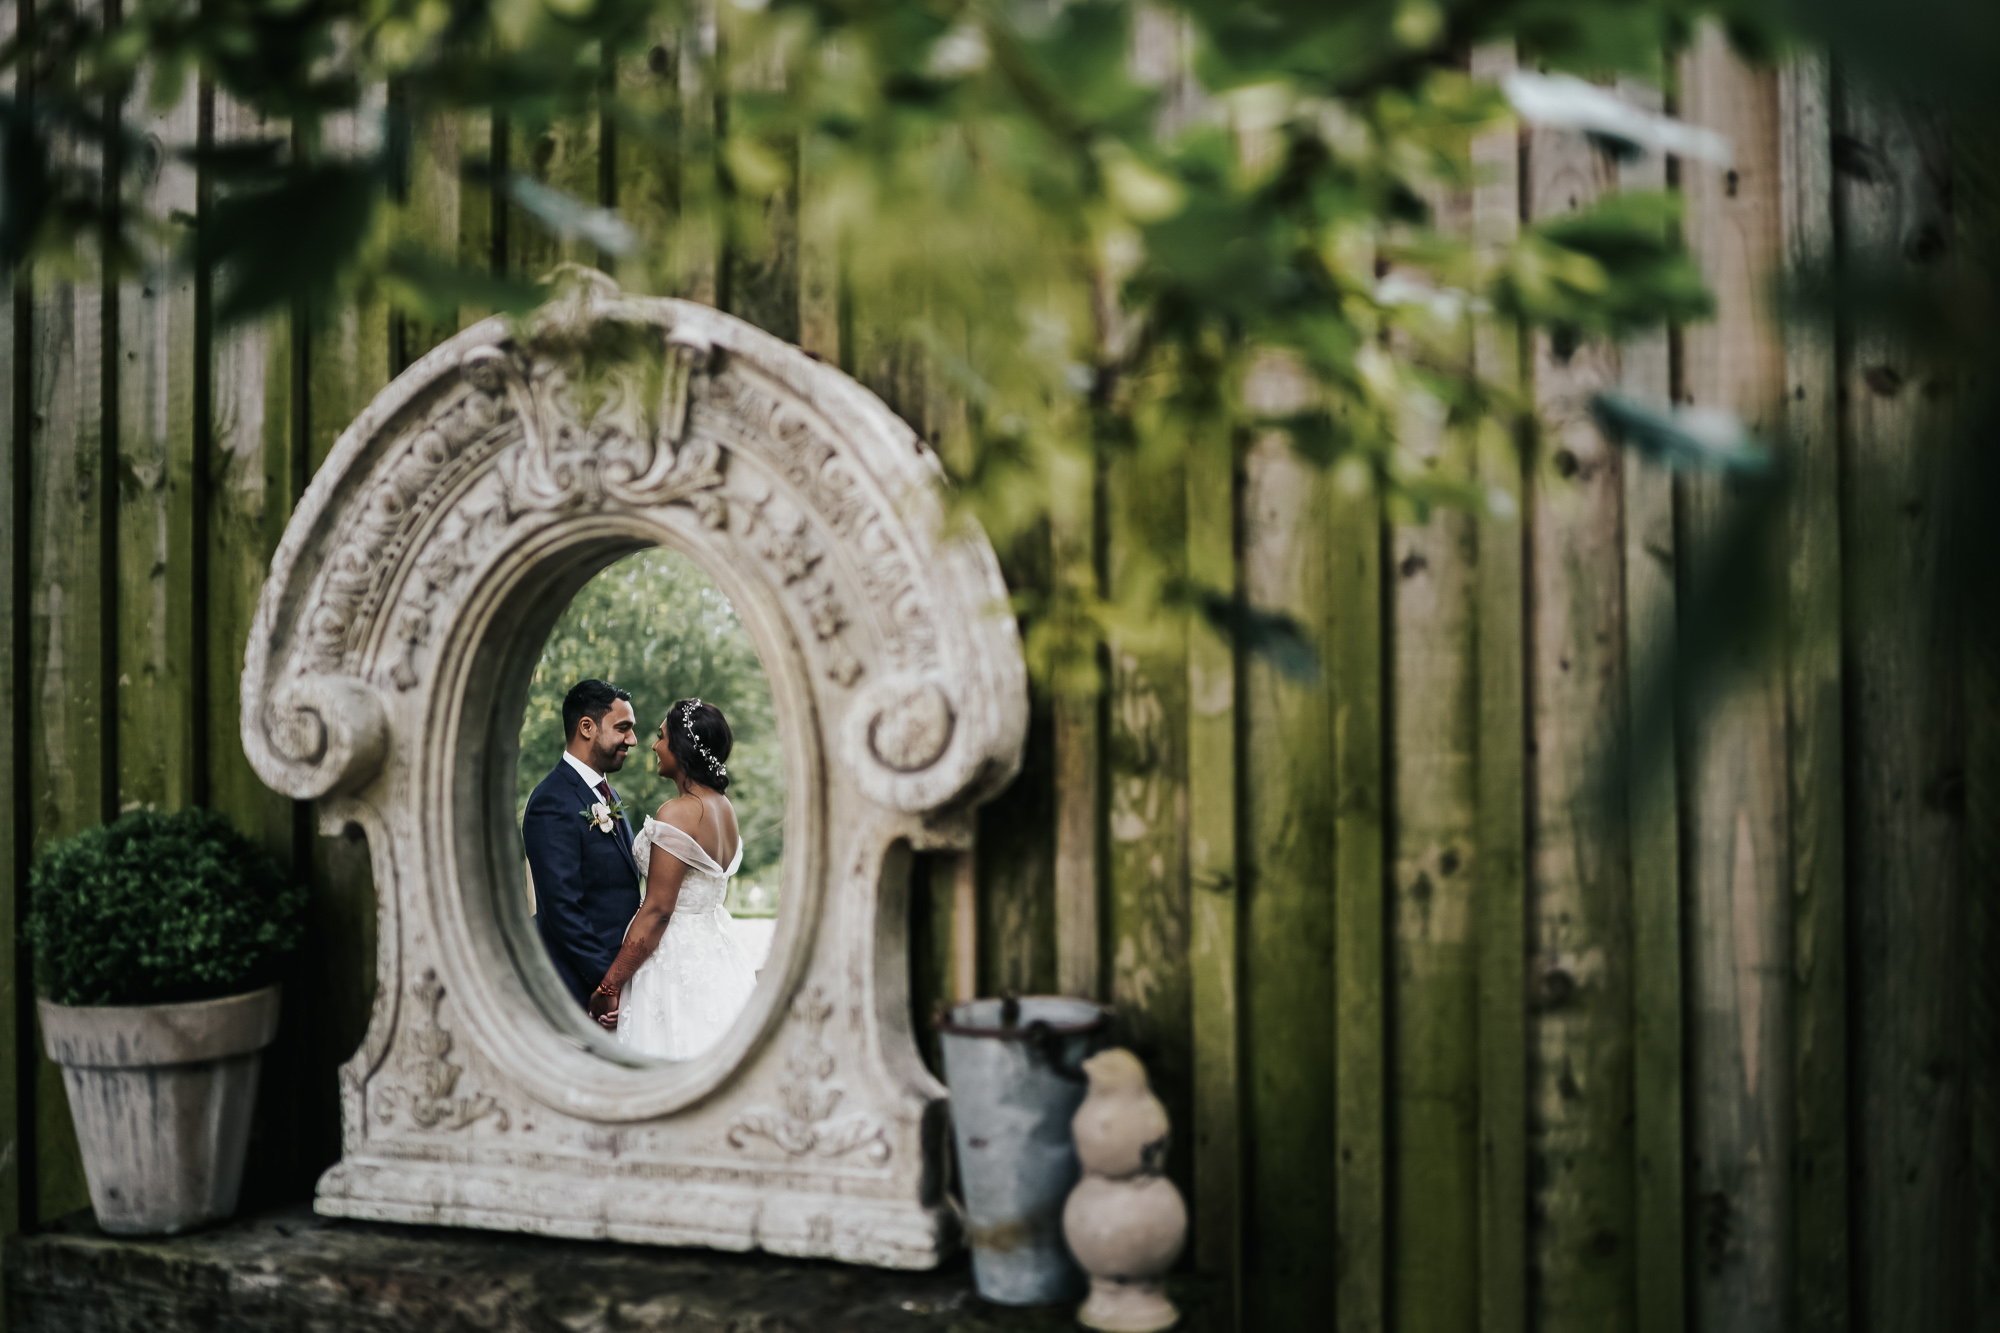 Alcumlow Hall Farm Indian Wedding Photographer (36 of 44).jpg